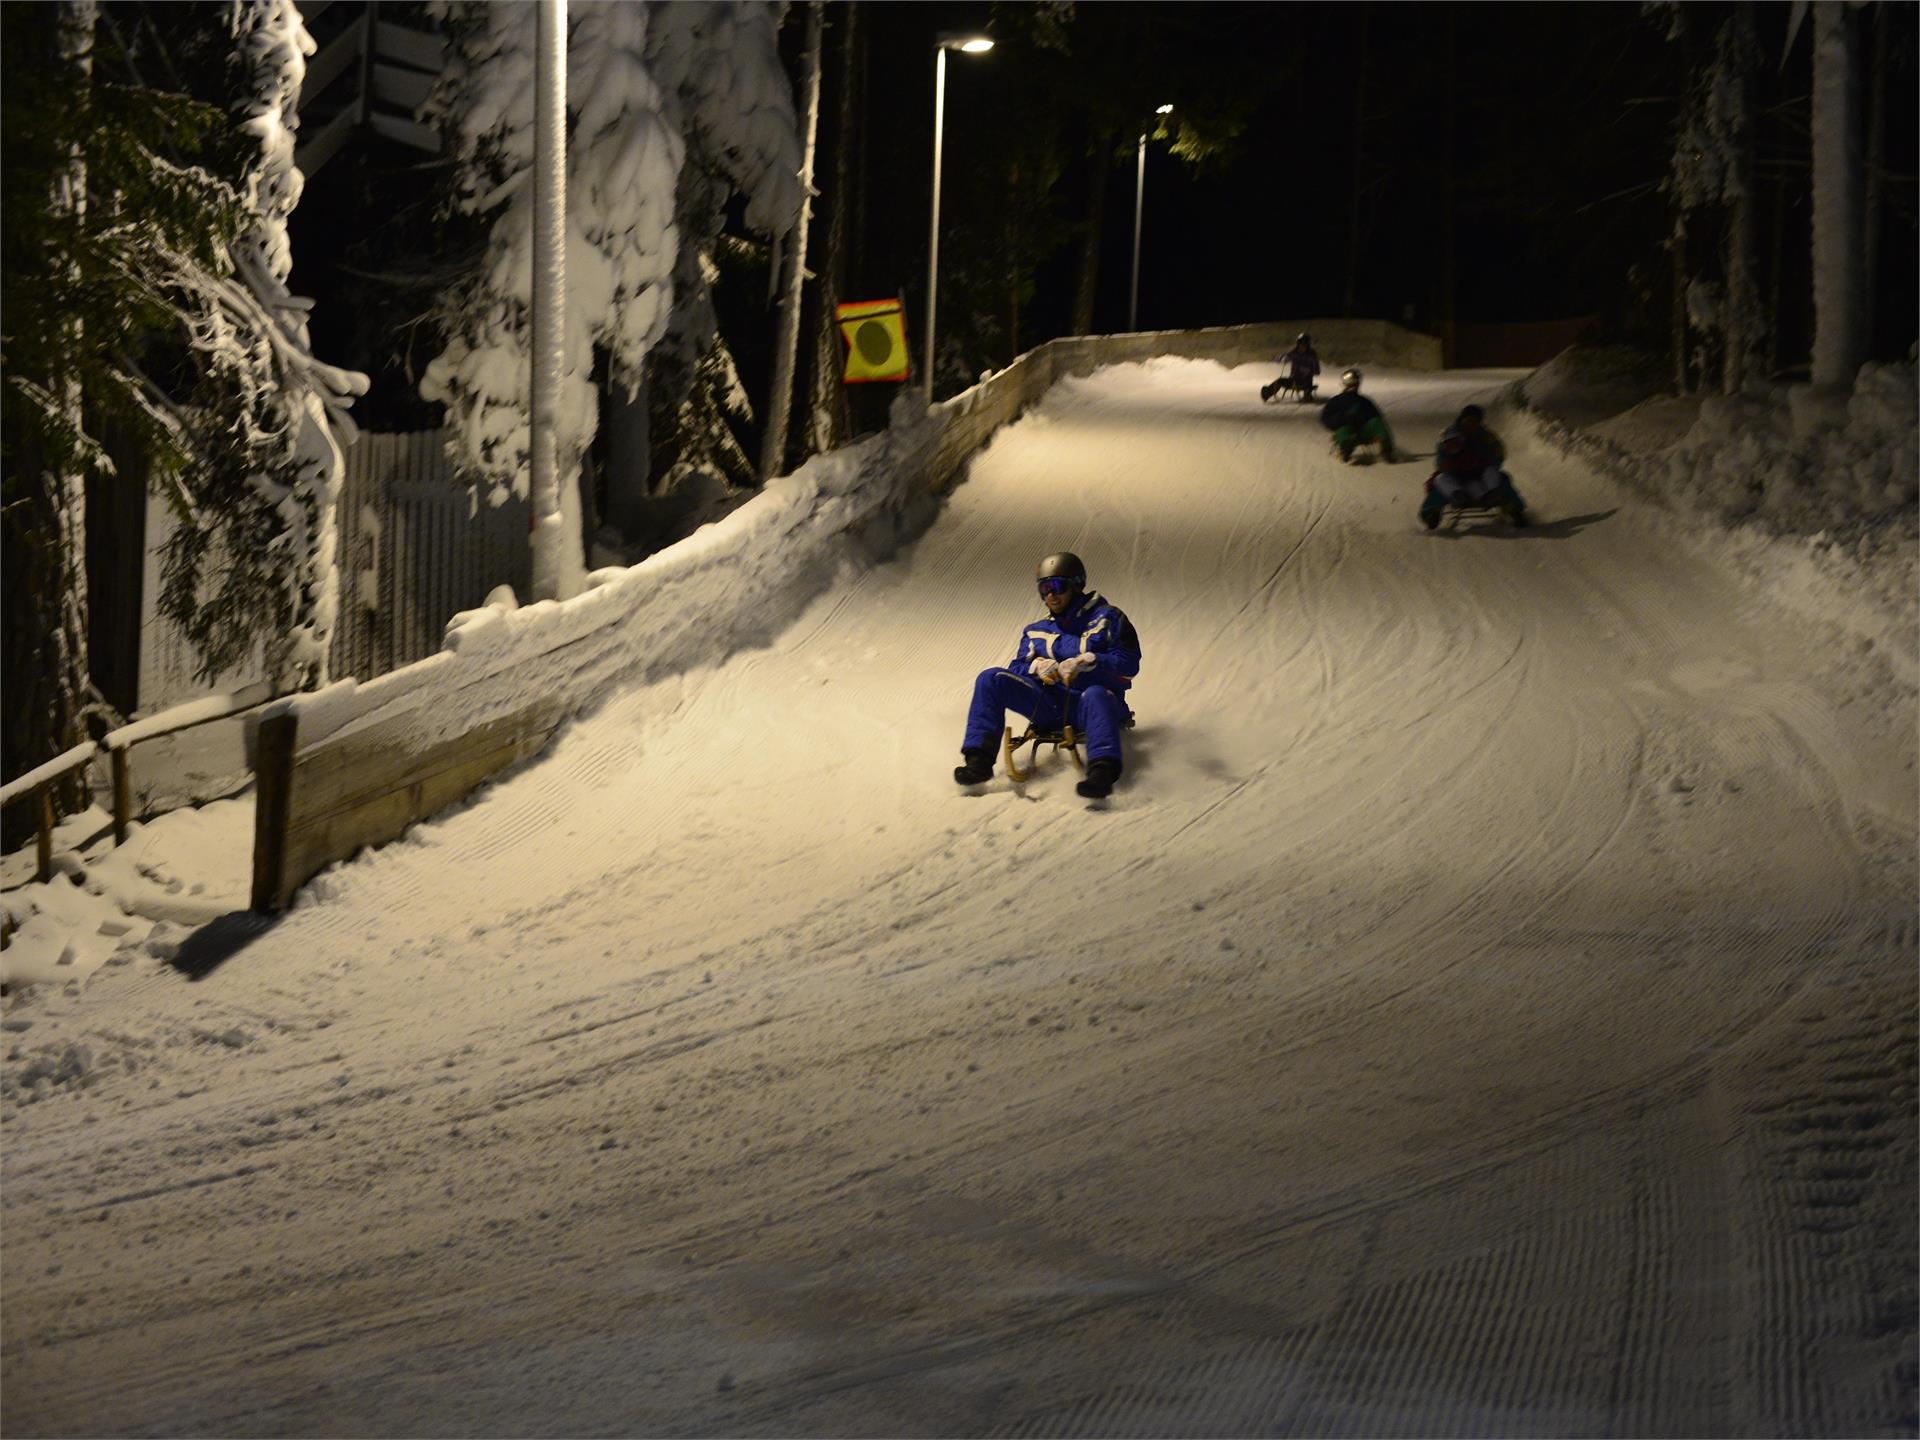 Night tobogganing and skiing on Cianross